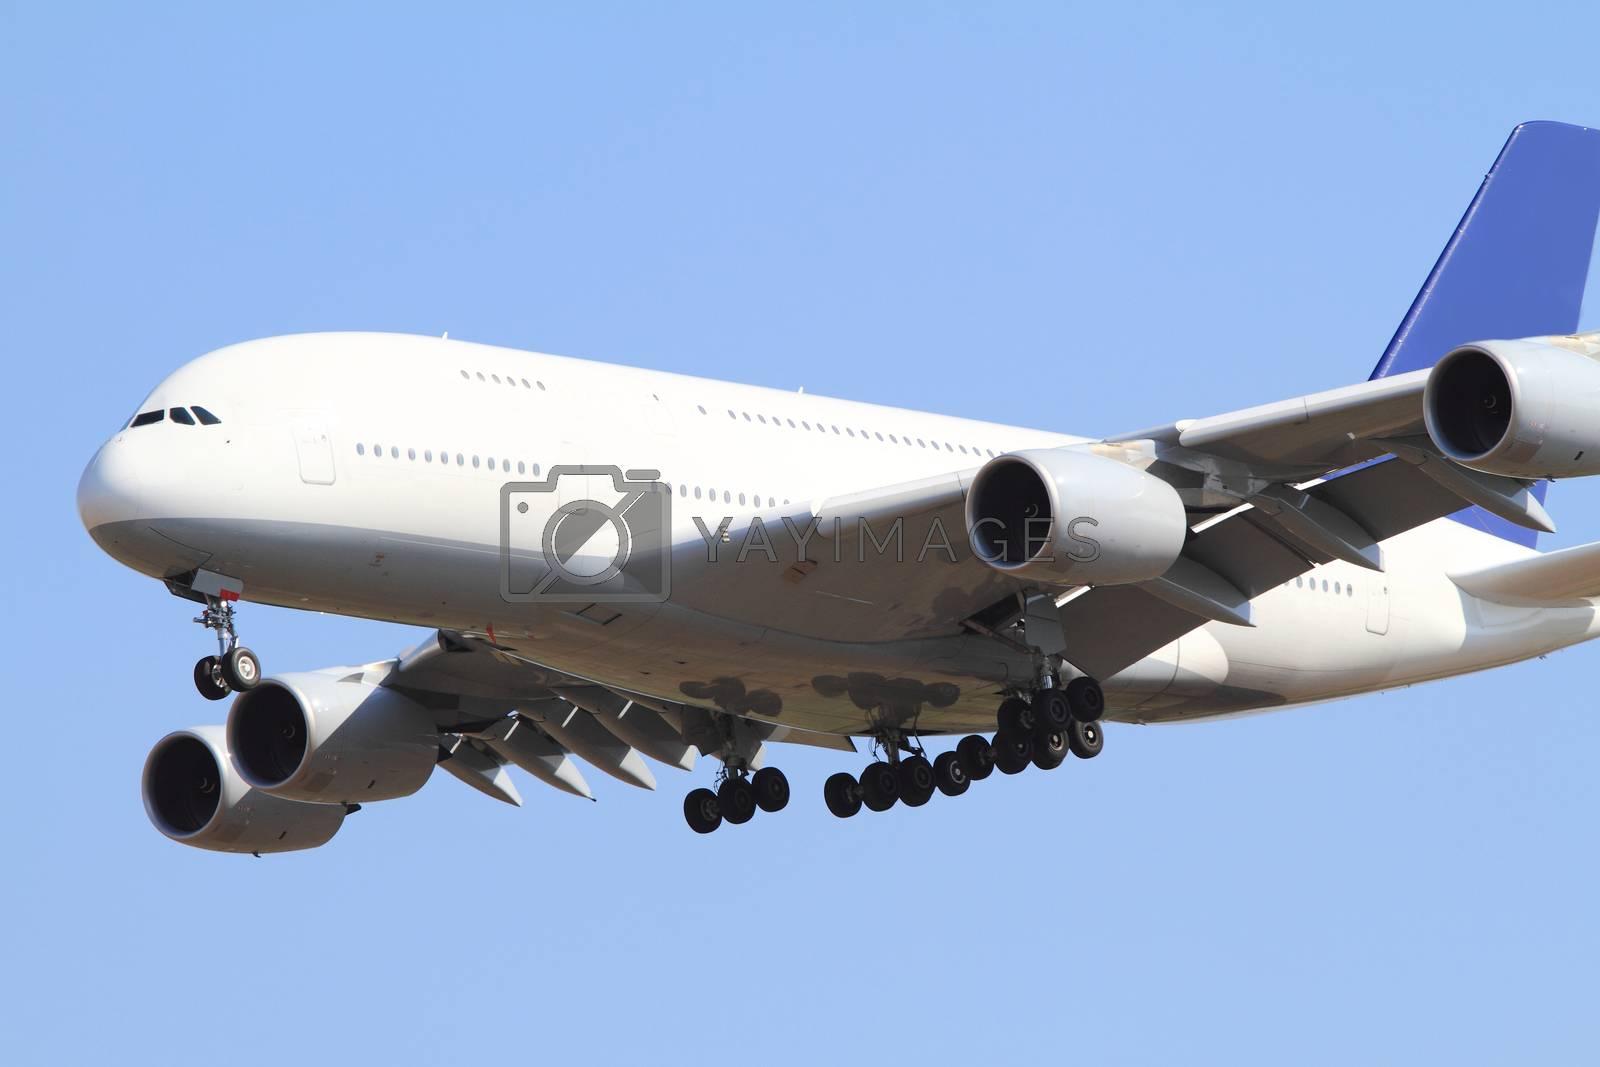 Close up photo of a wihte passenger air